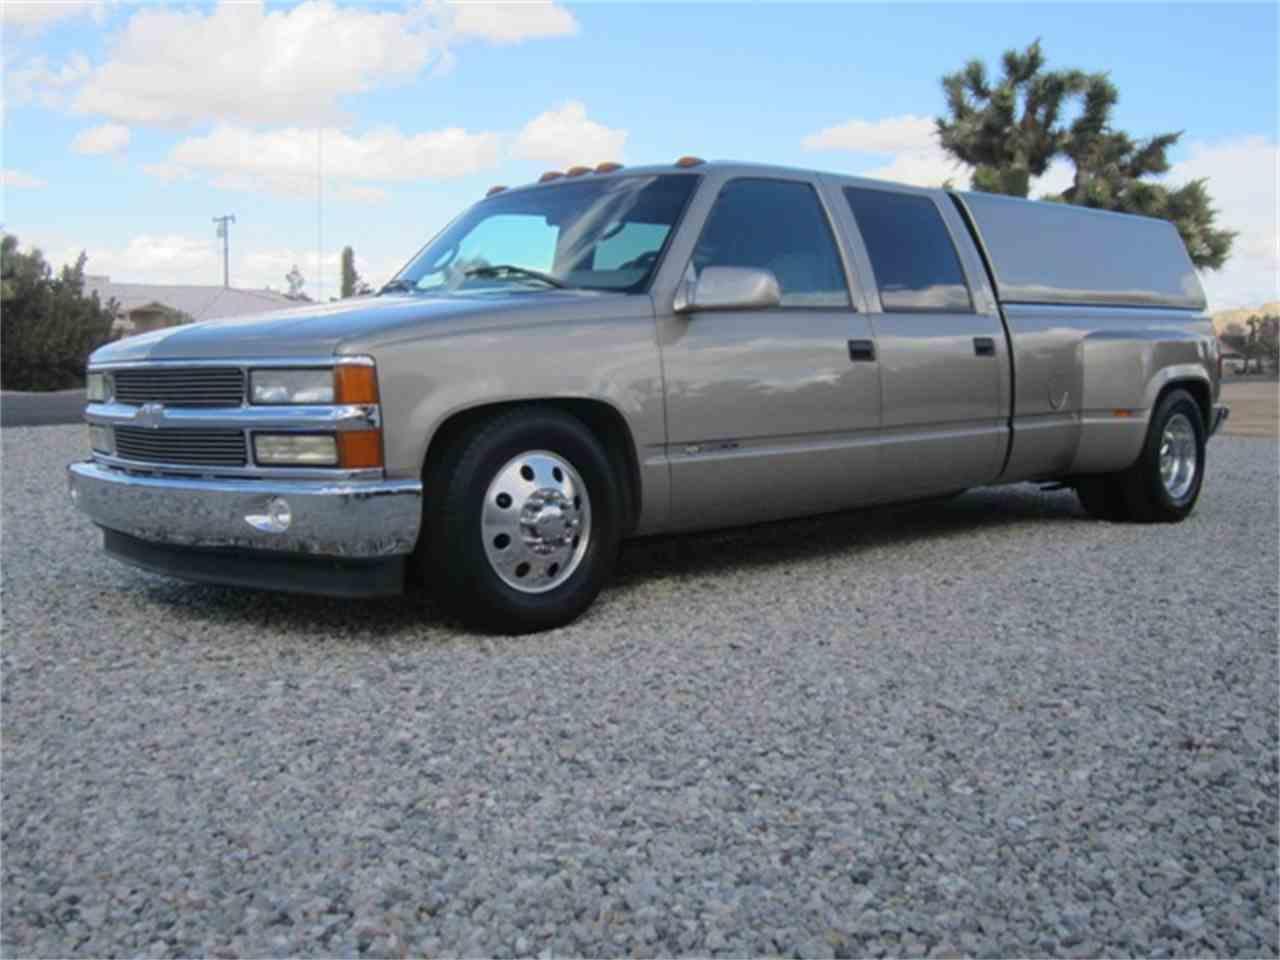 All Chevy 99 chevy 3500 : 1999 Chevrolet 3500 CREW CAB DUALLY for Sale | ClassicCars.com ...